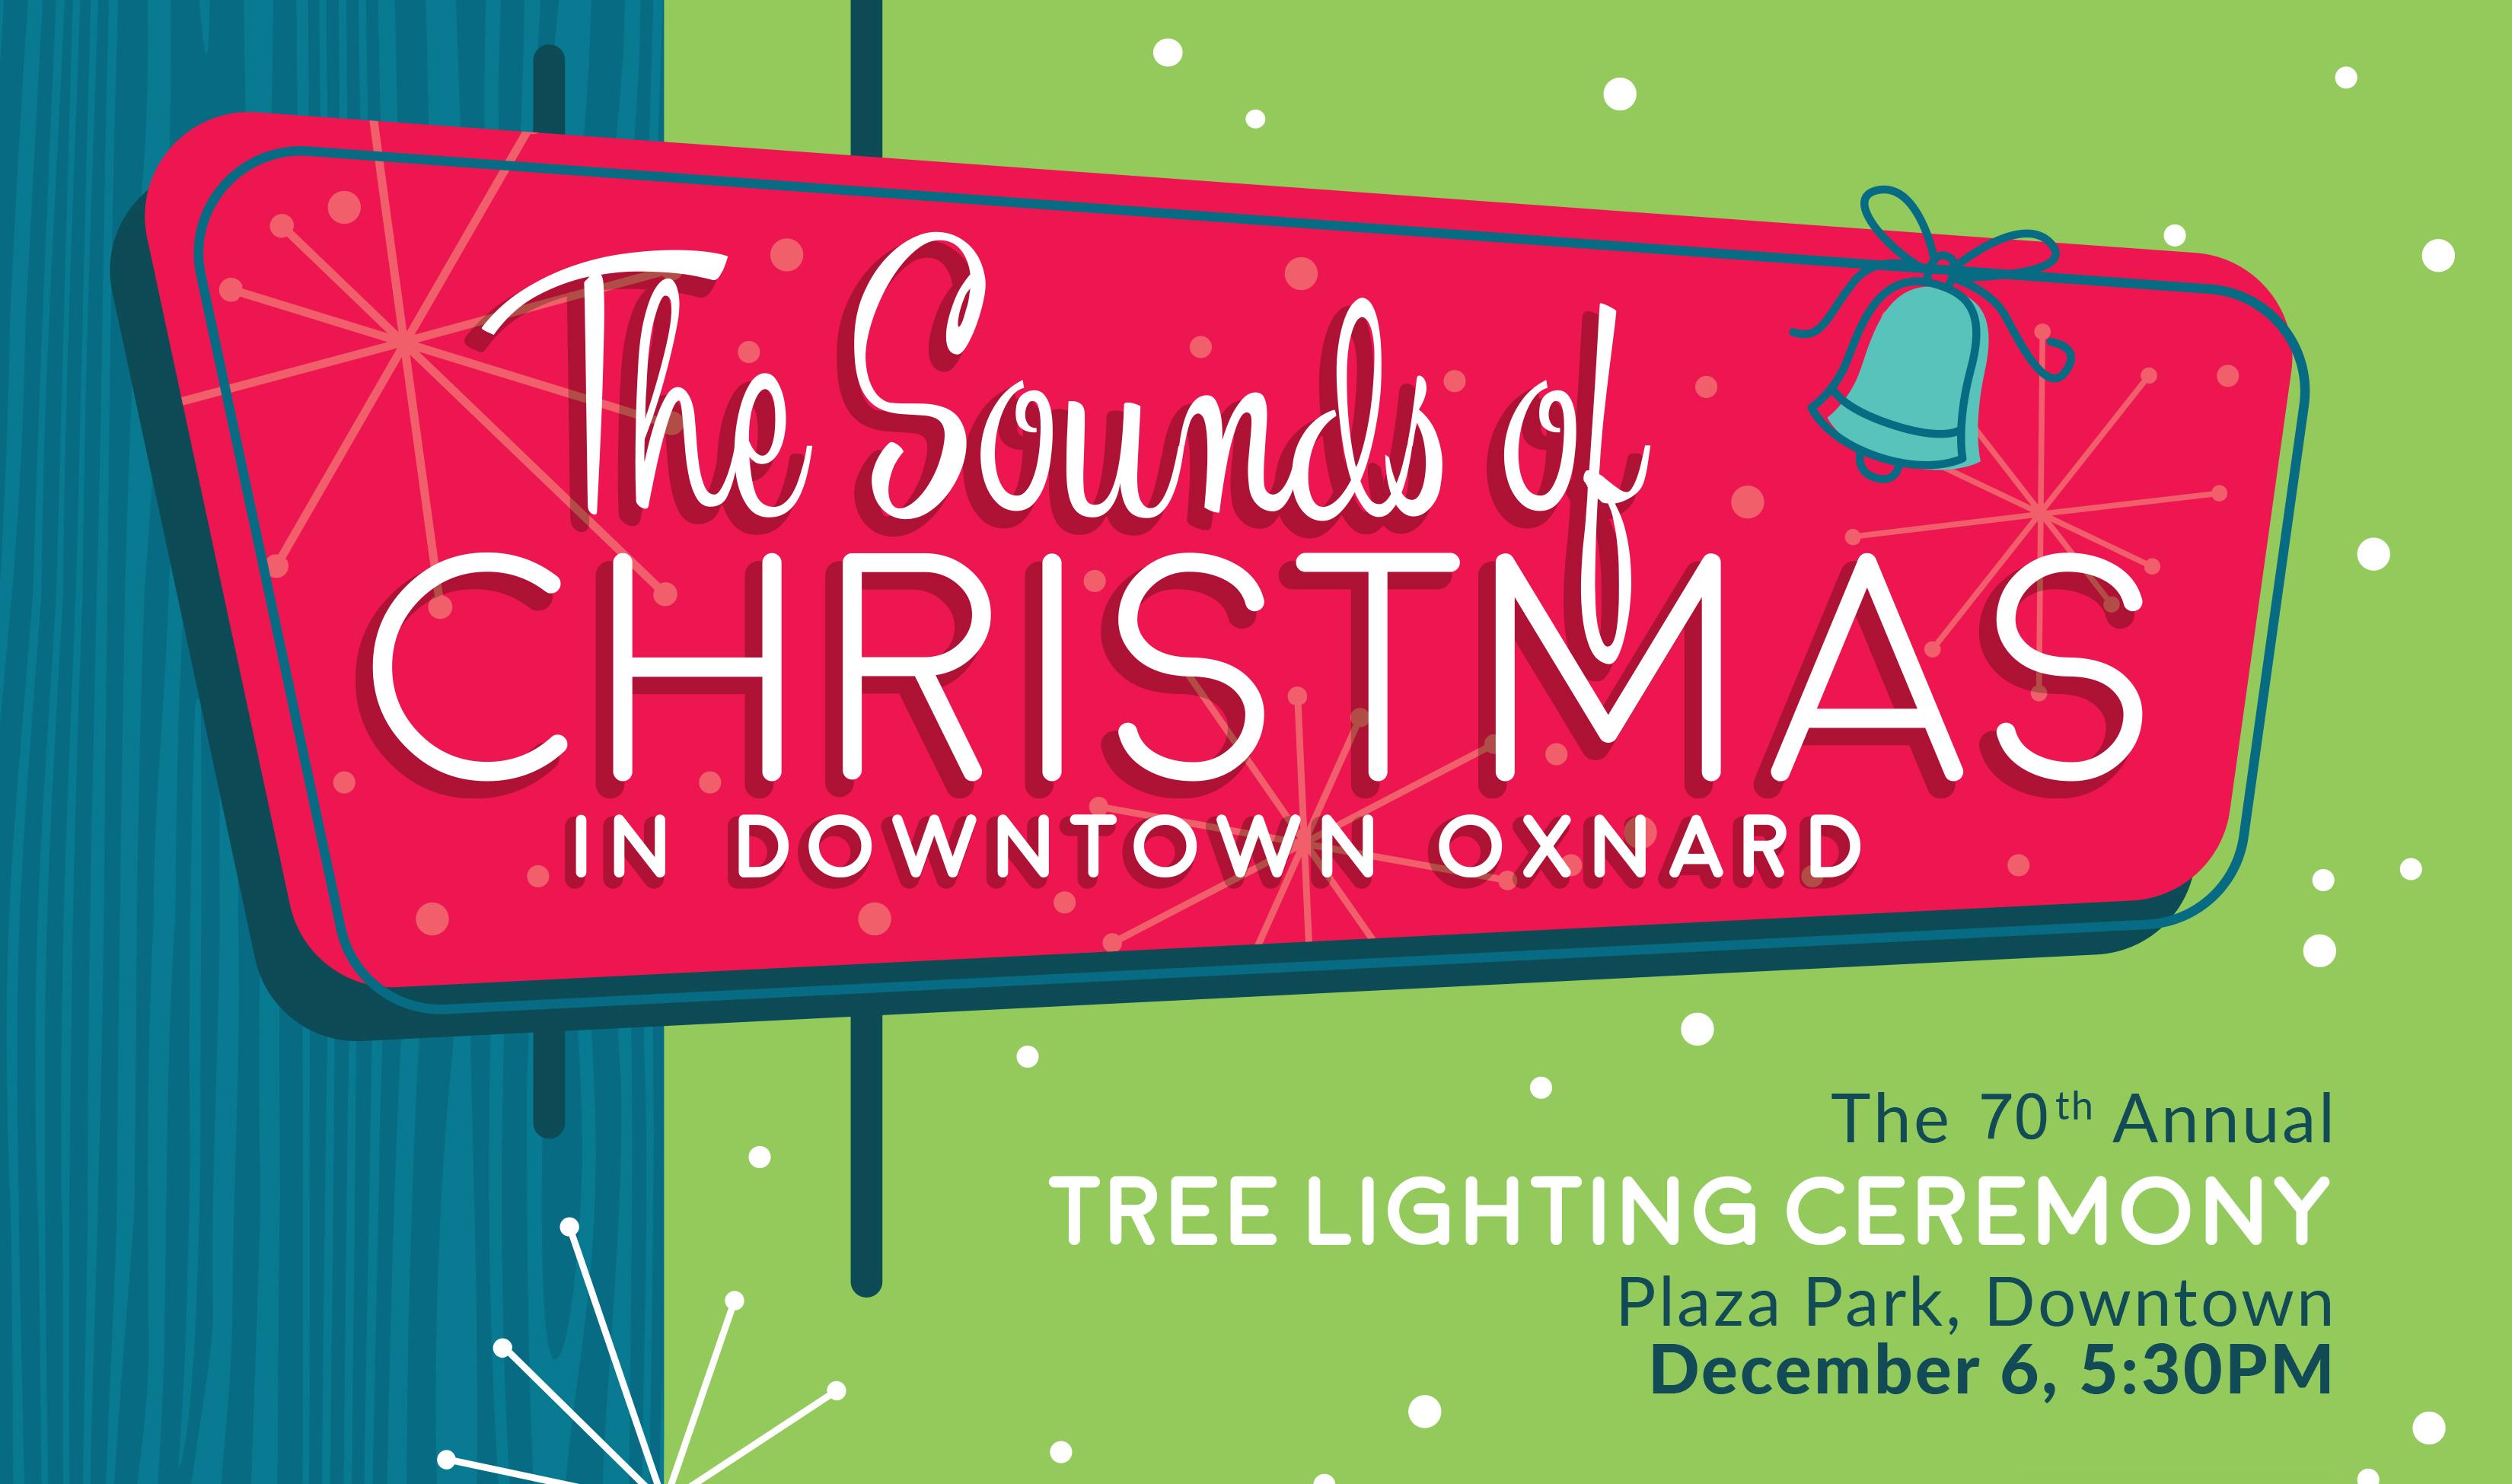 69th Annual Oxnard Tree Lighting Ceremony